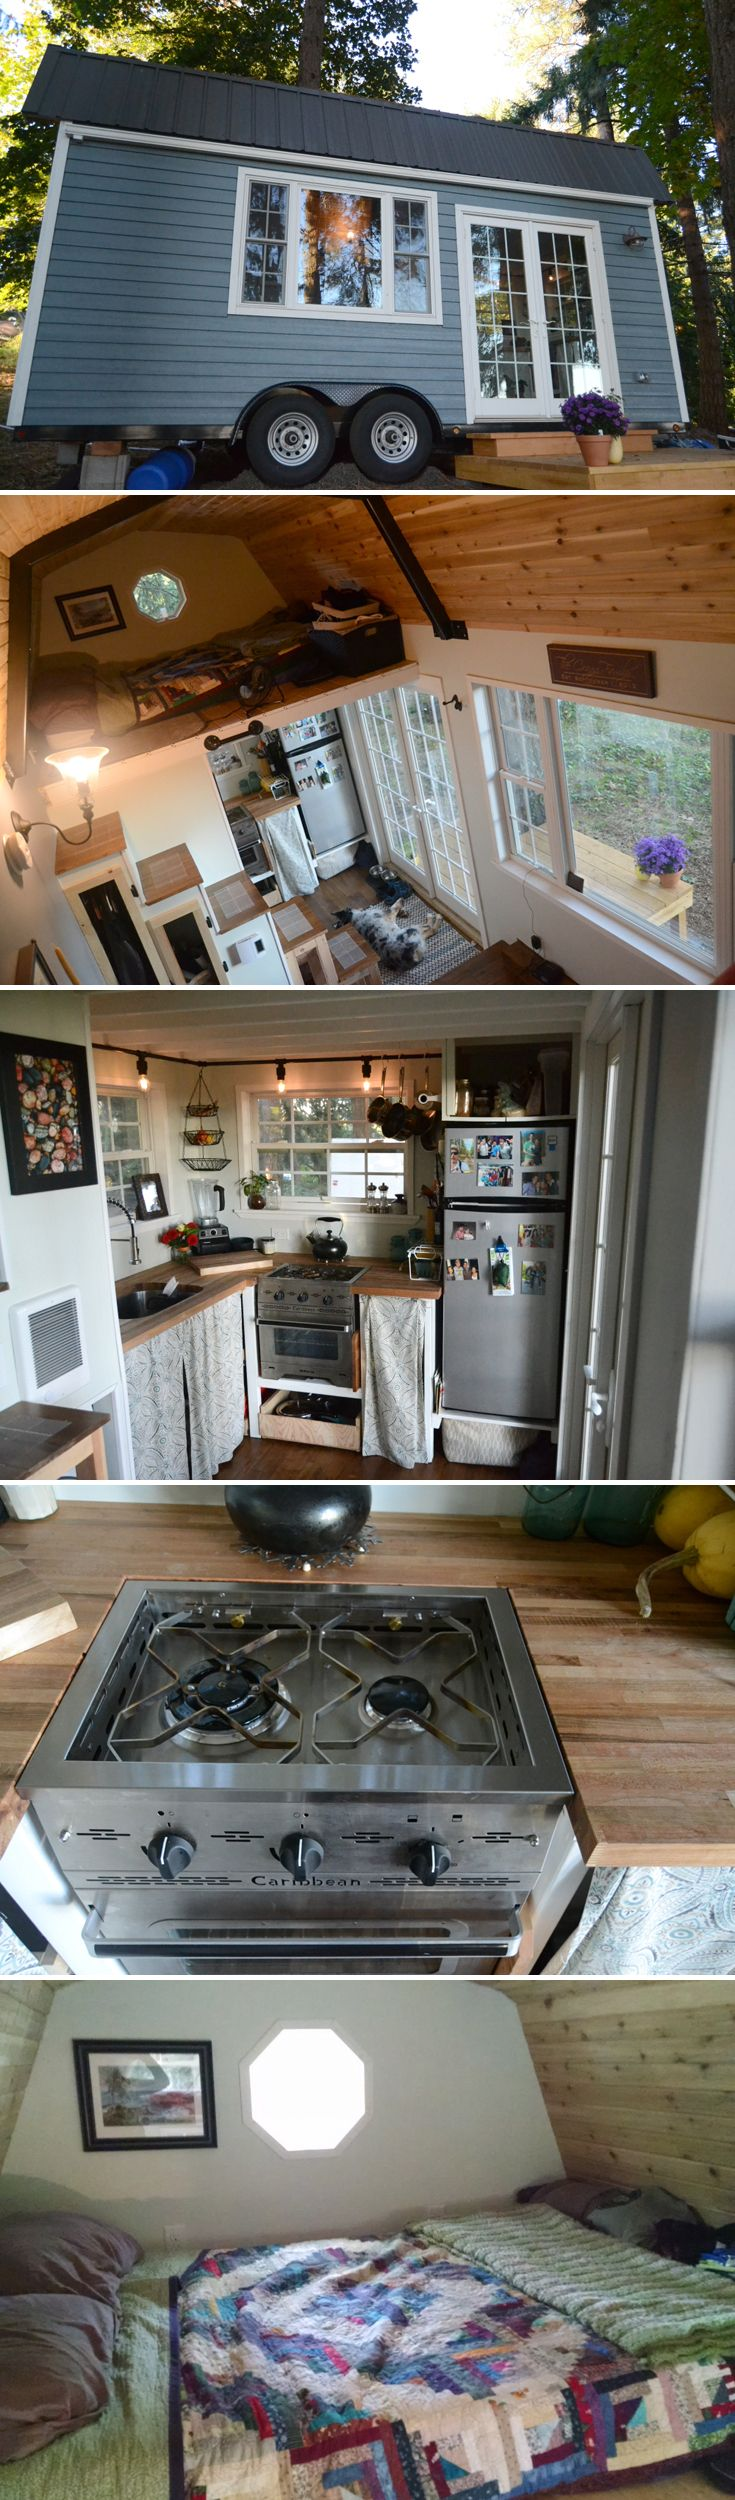 Best 20 tiny house kits ideas on pinterest - Theusd tiny house the shortest way to freedom ...